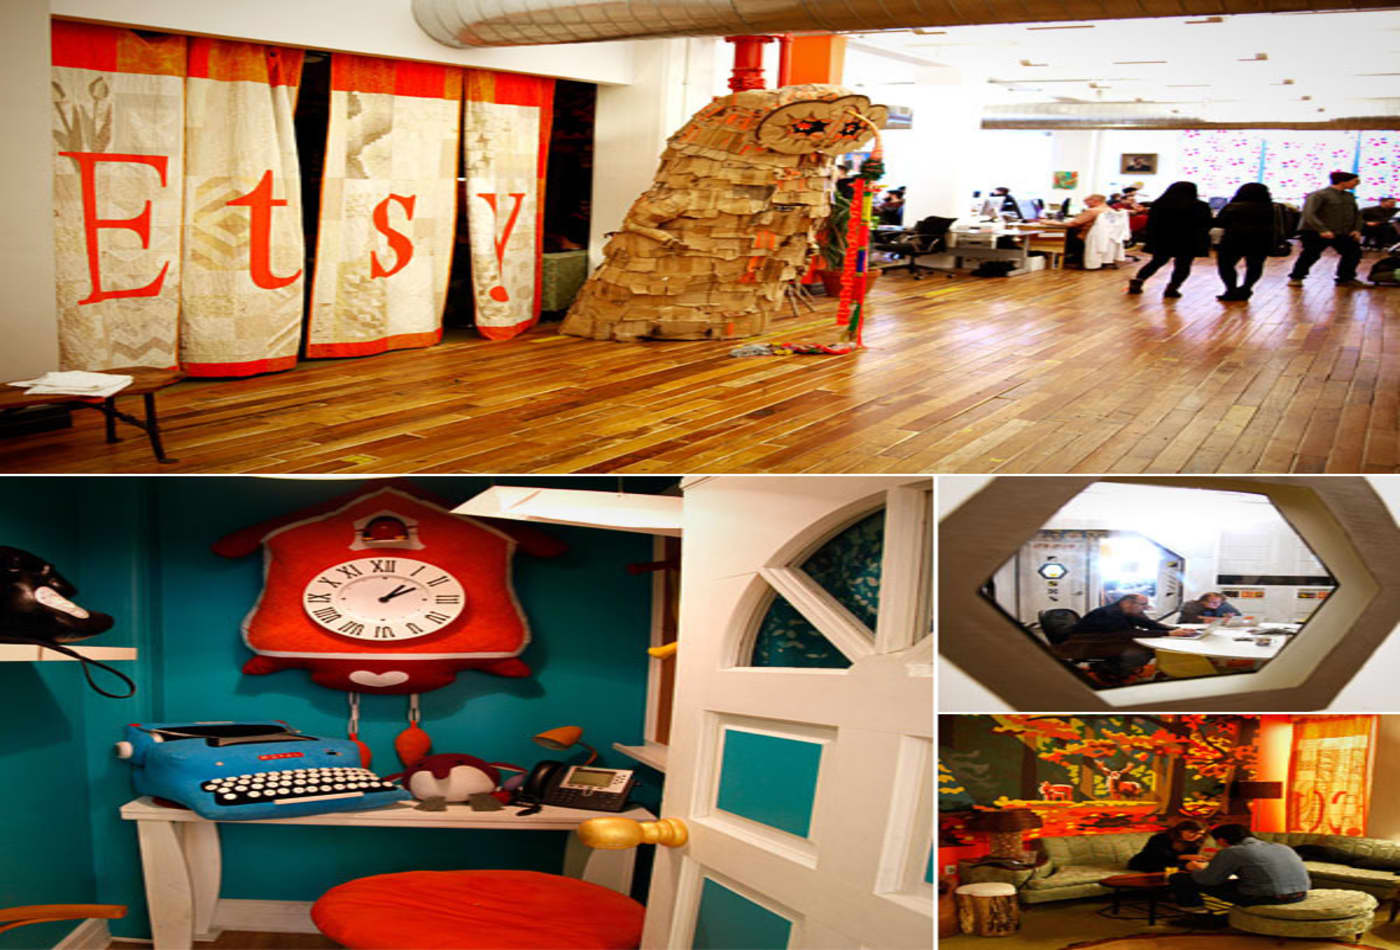 Etsy-Brooklyn-Coolest-Corporate-Headquarters-CNBC.jpg